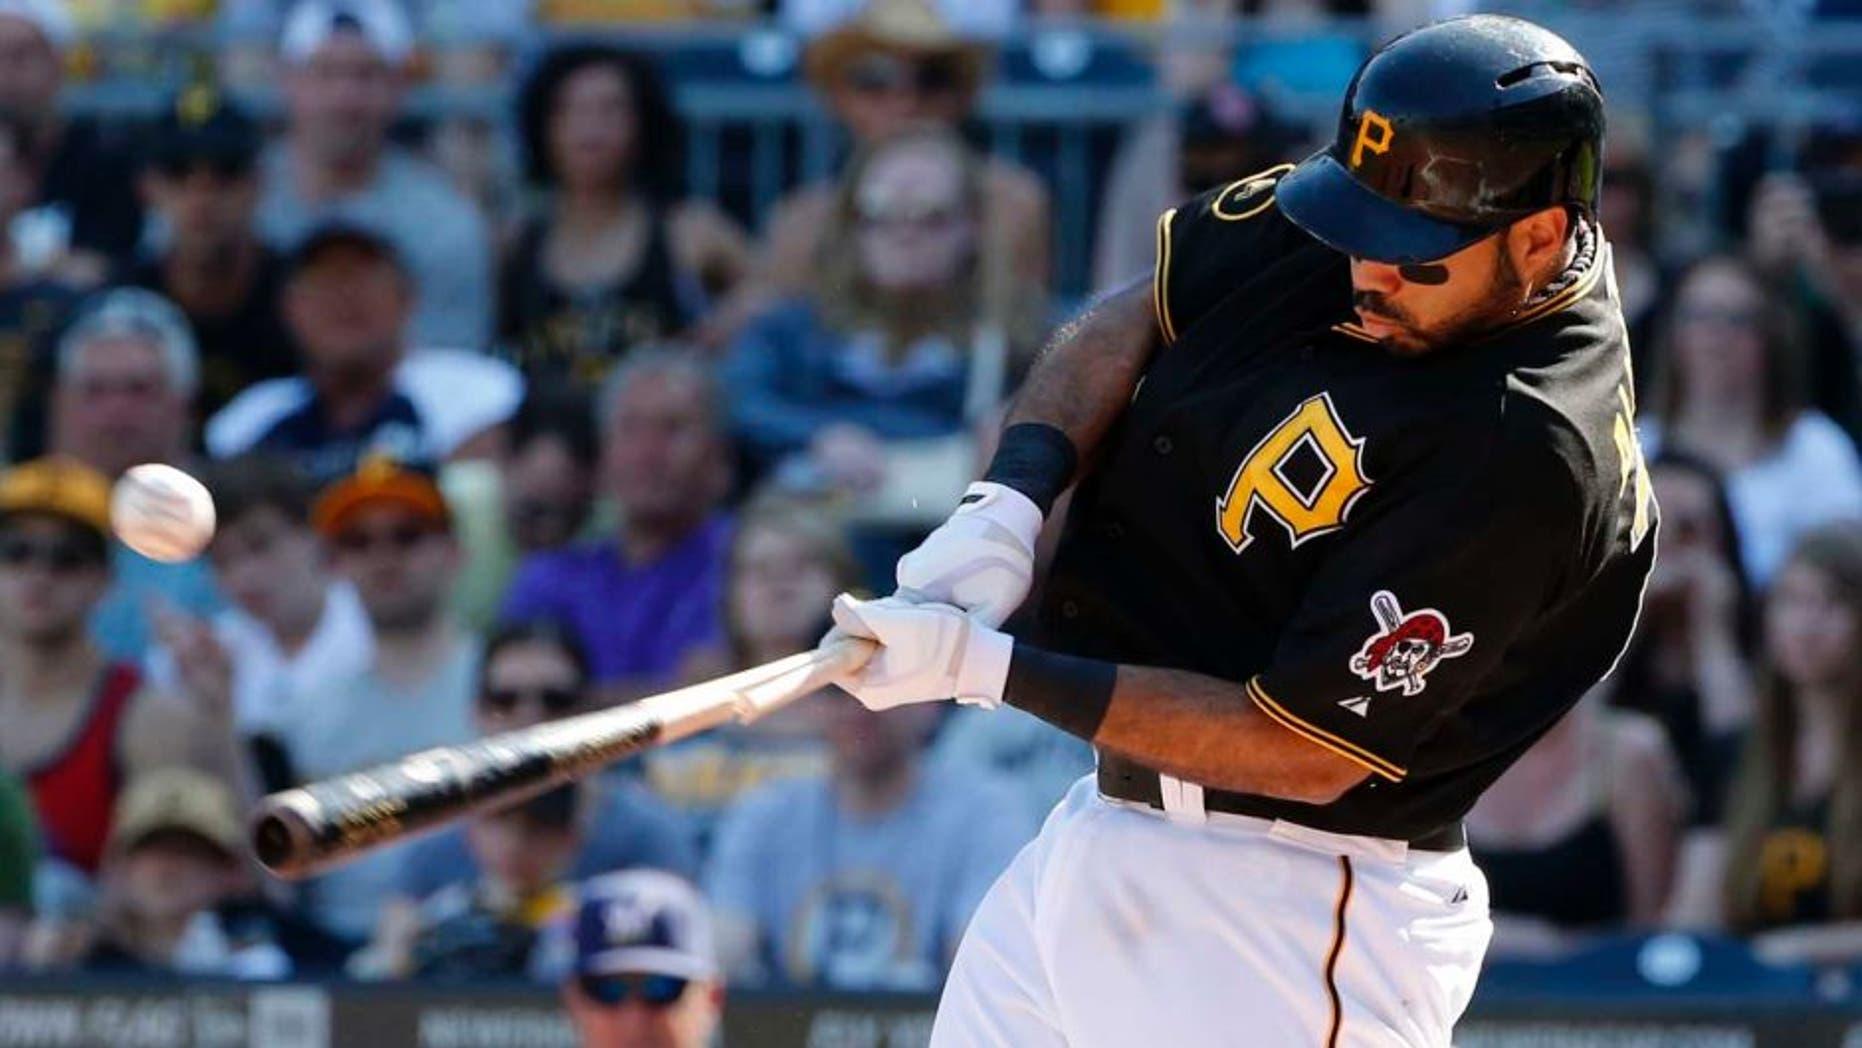 Saturday, June 7: The Pittsburgh Pirates' Pedro Alvarez drives in a run with a broken-bat single off Milwaukee Brewers starting pitcher Matt Garza during the third inning.